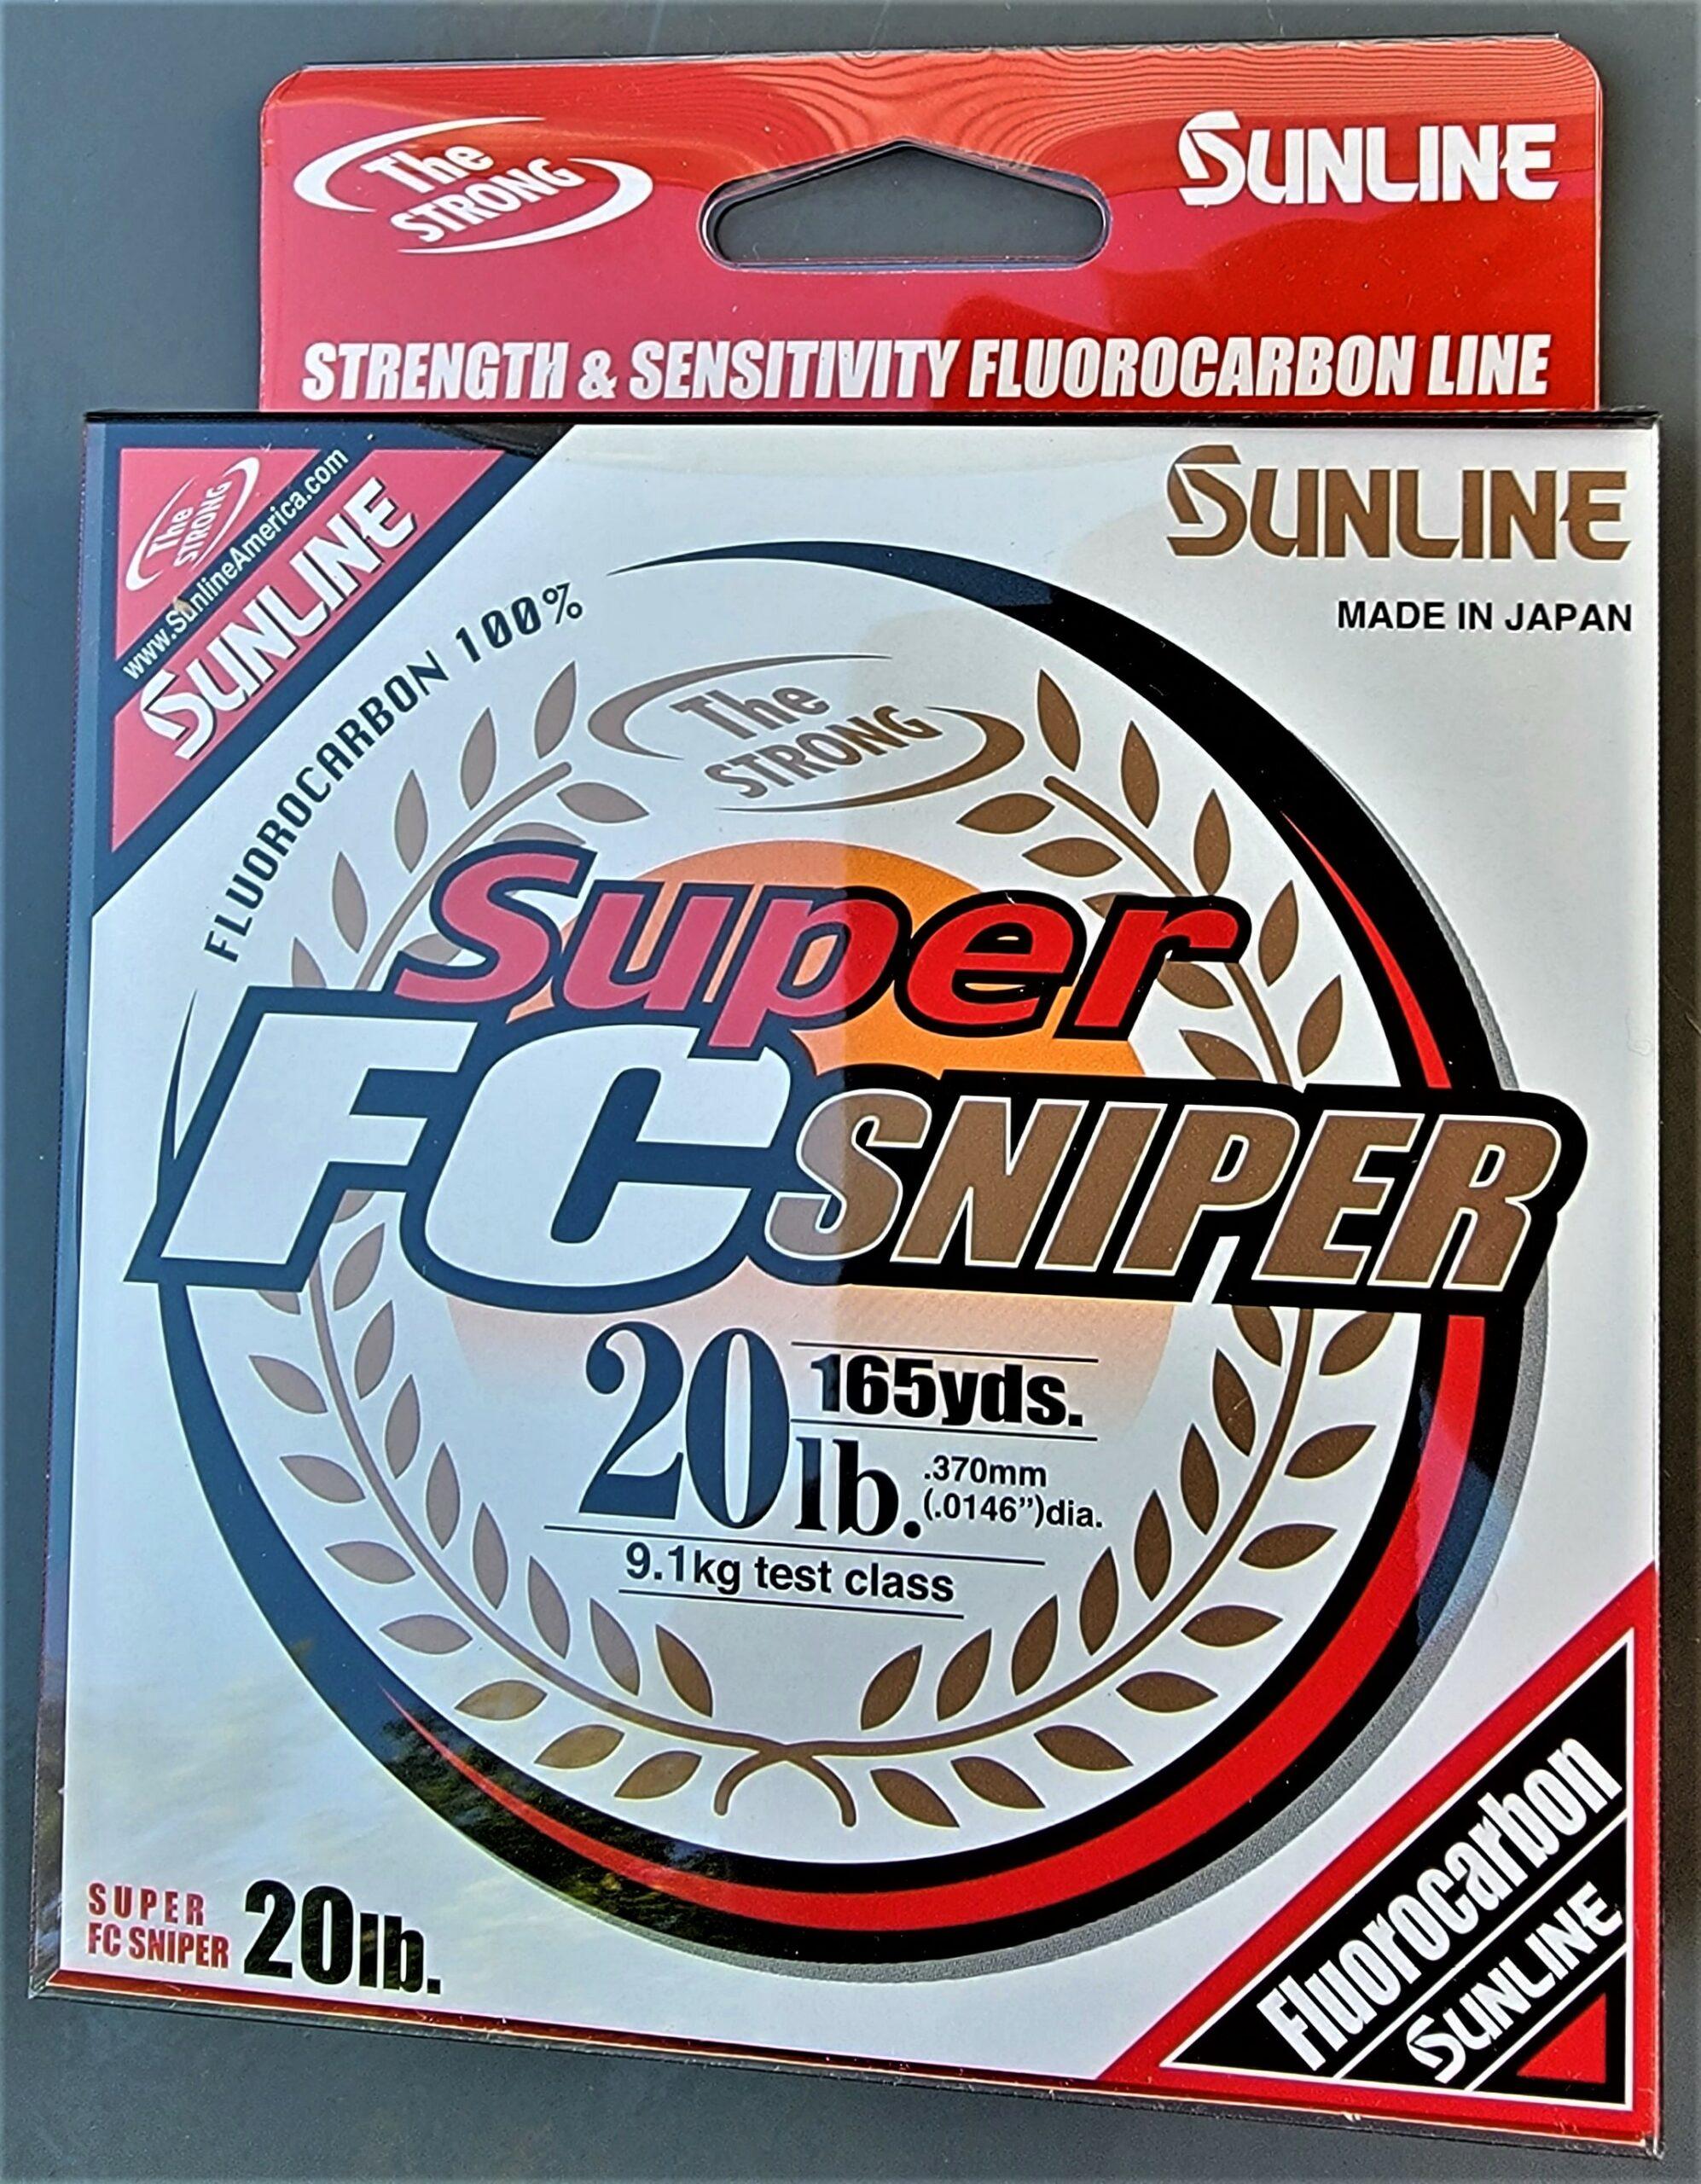 Sunline - Super FC Sniper - 165 YD - Super FC Sniper - 20 LB - Natural Clear